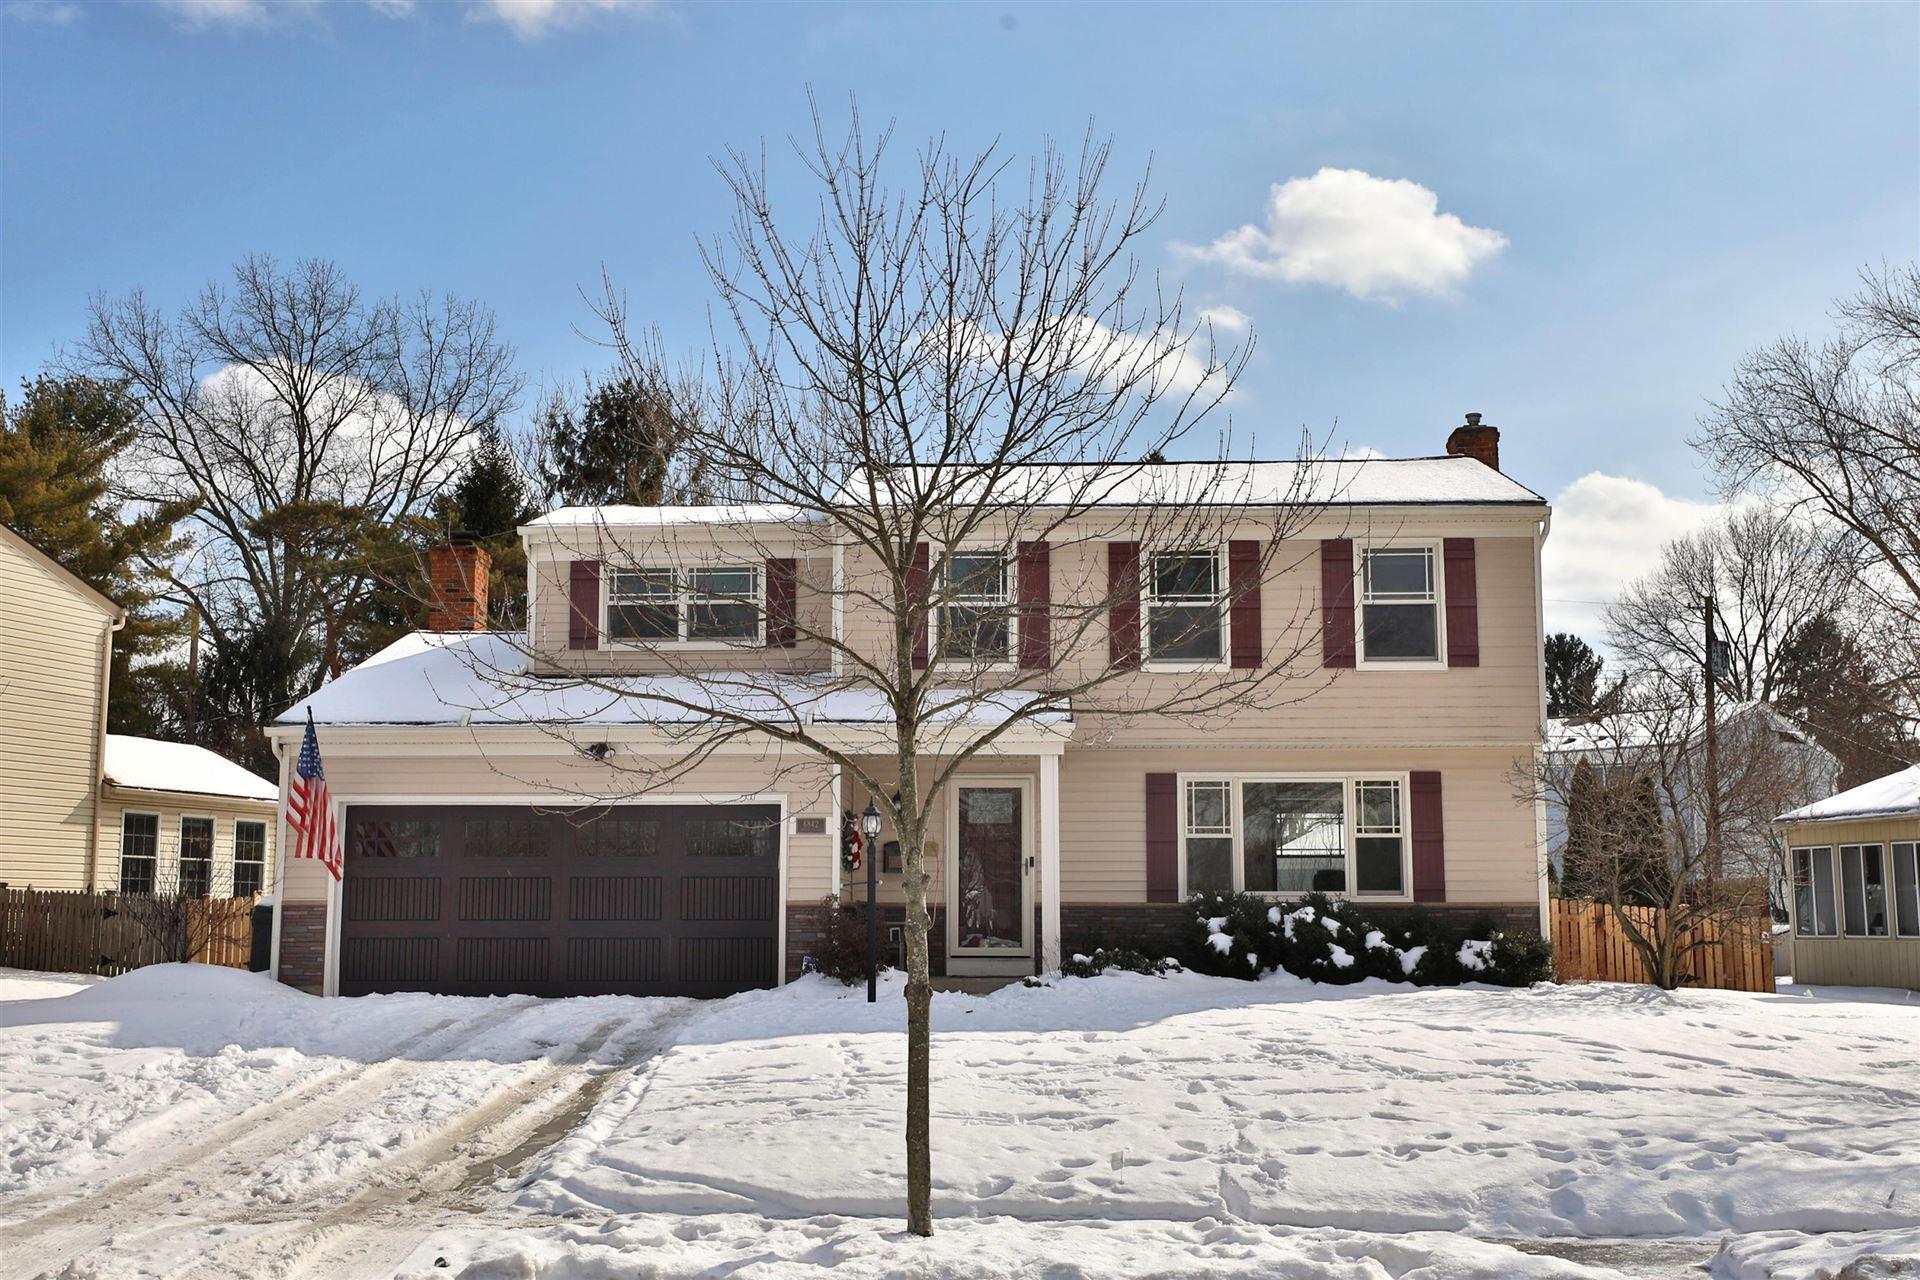 Photo of 6842 Abbot Place, Worthington, OH 43085 (MLS # 221003662)